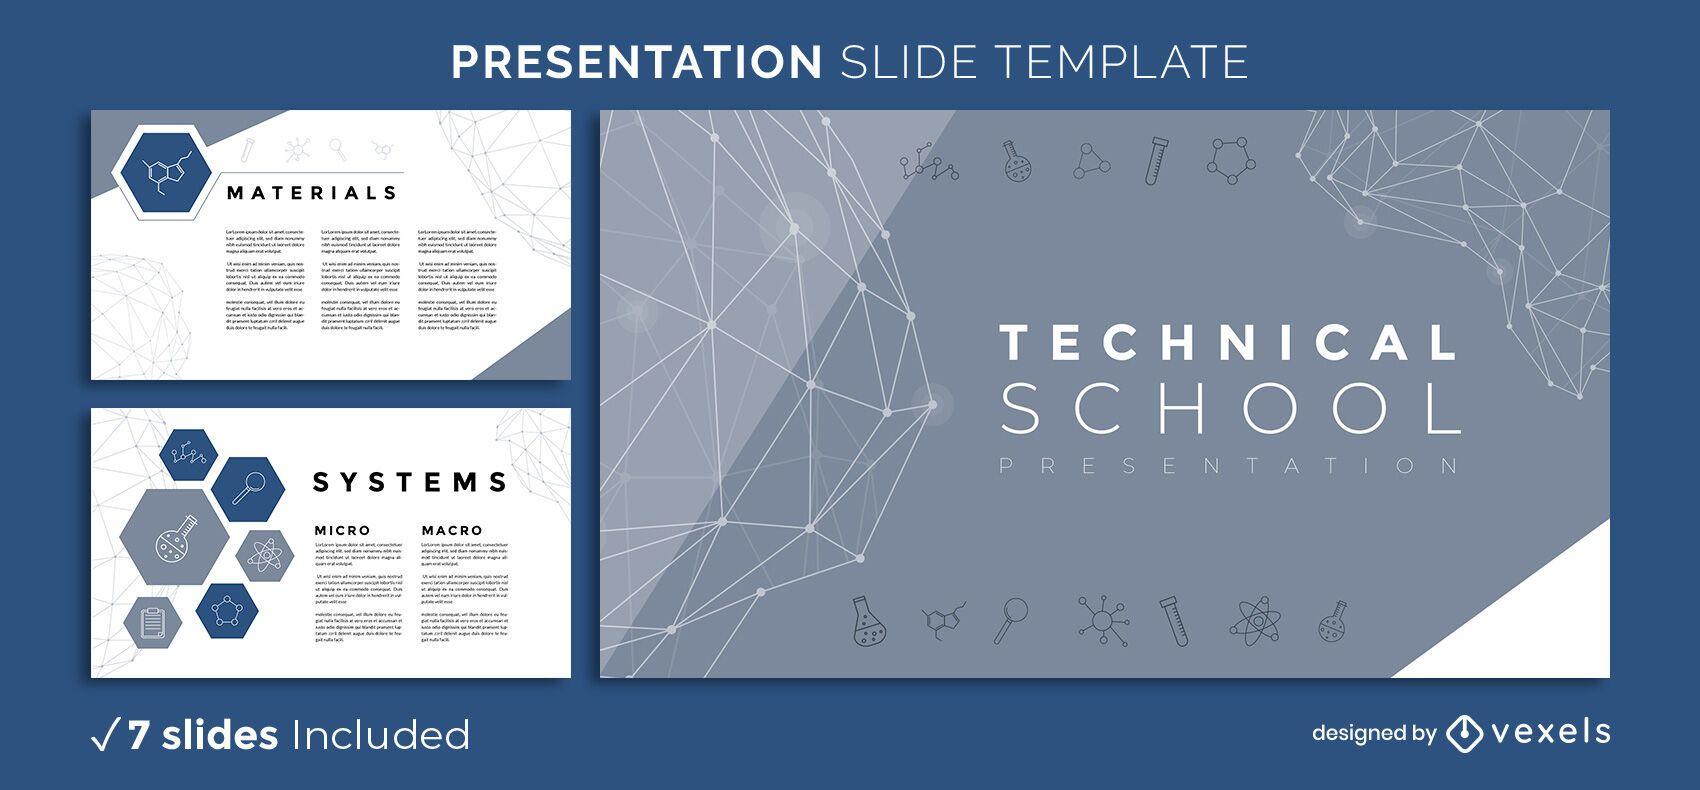 Technical School Presentation Template